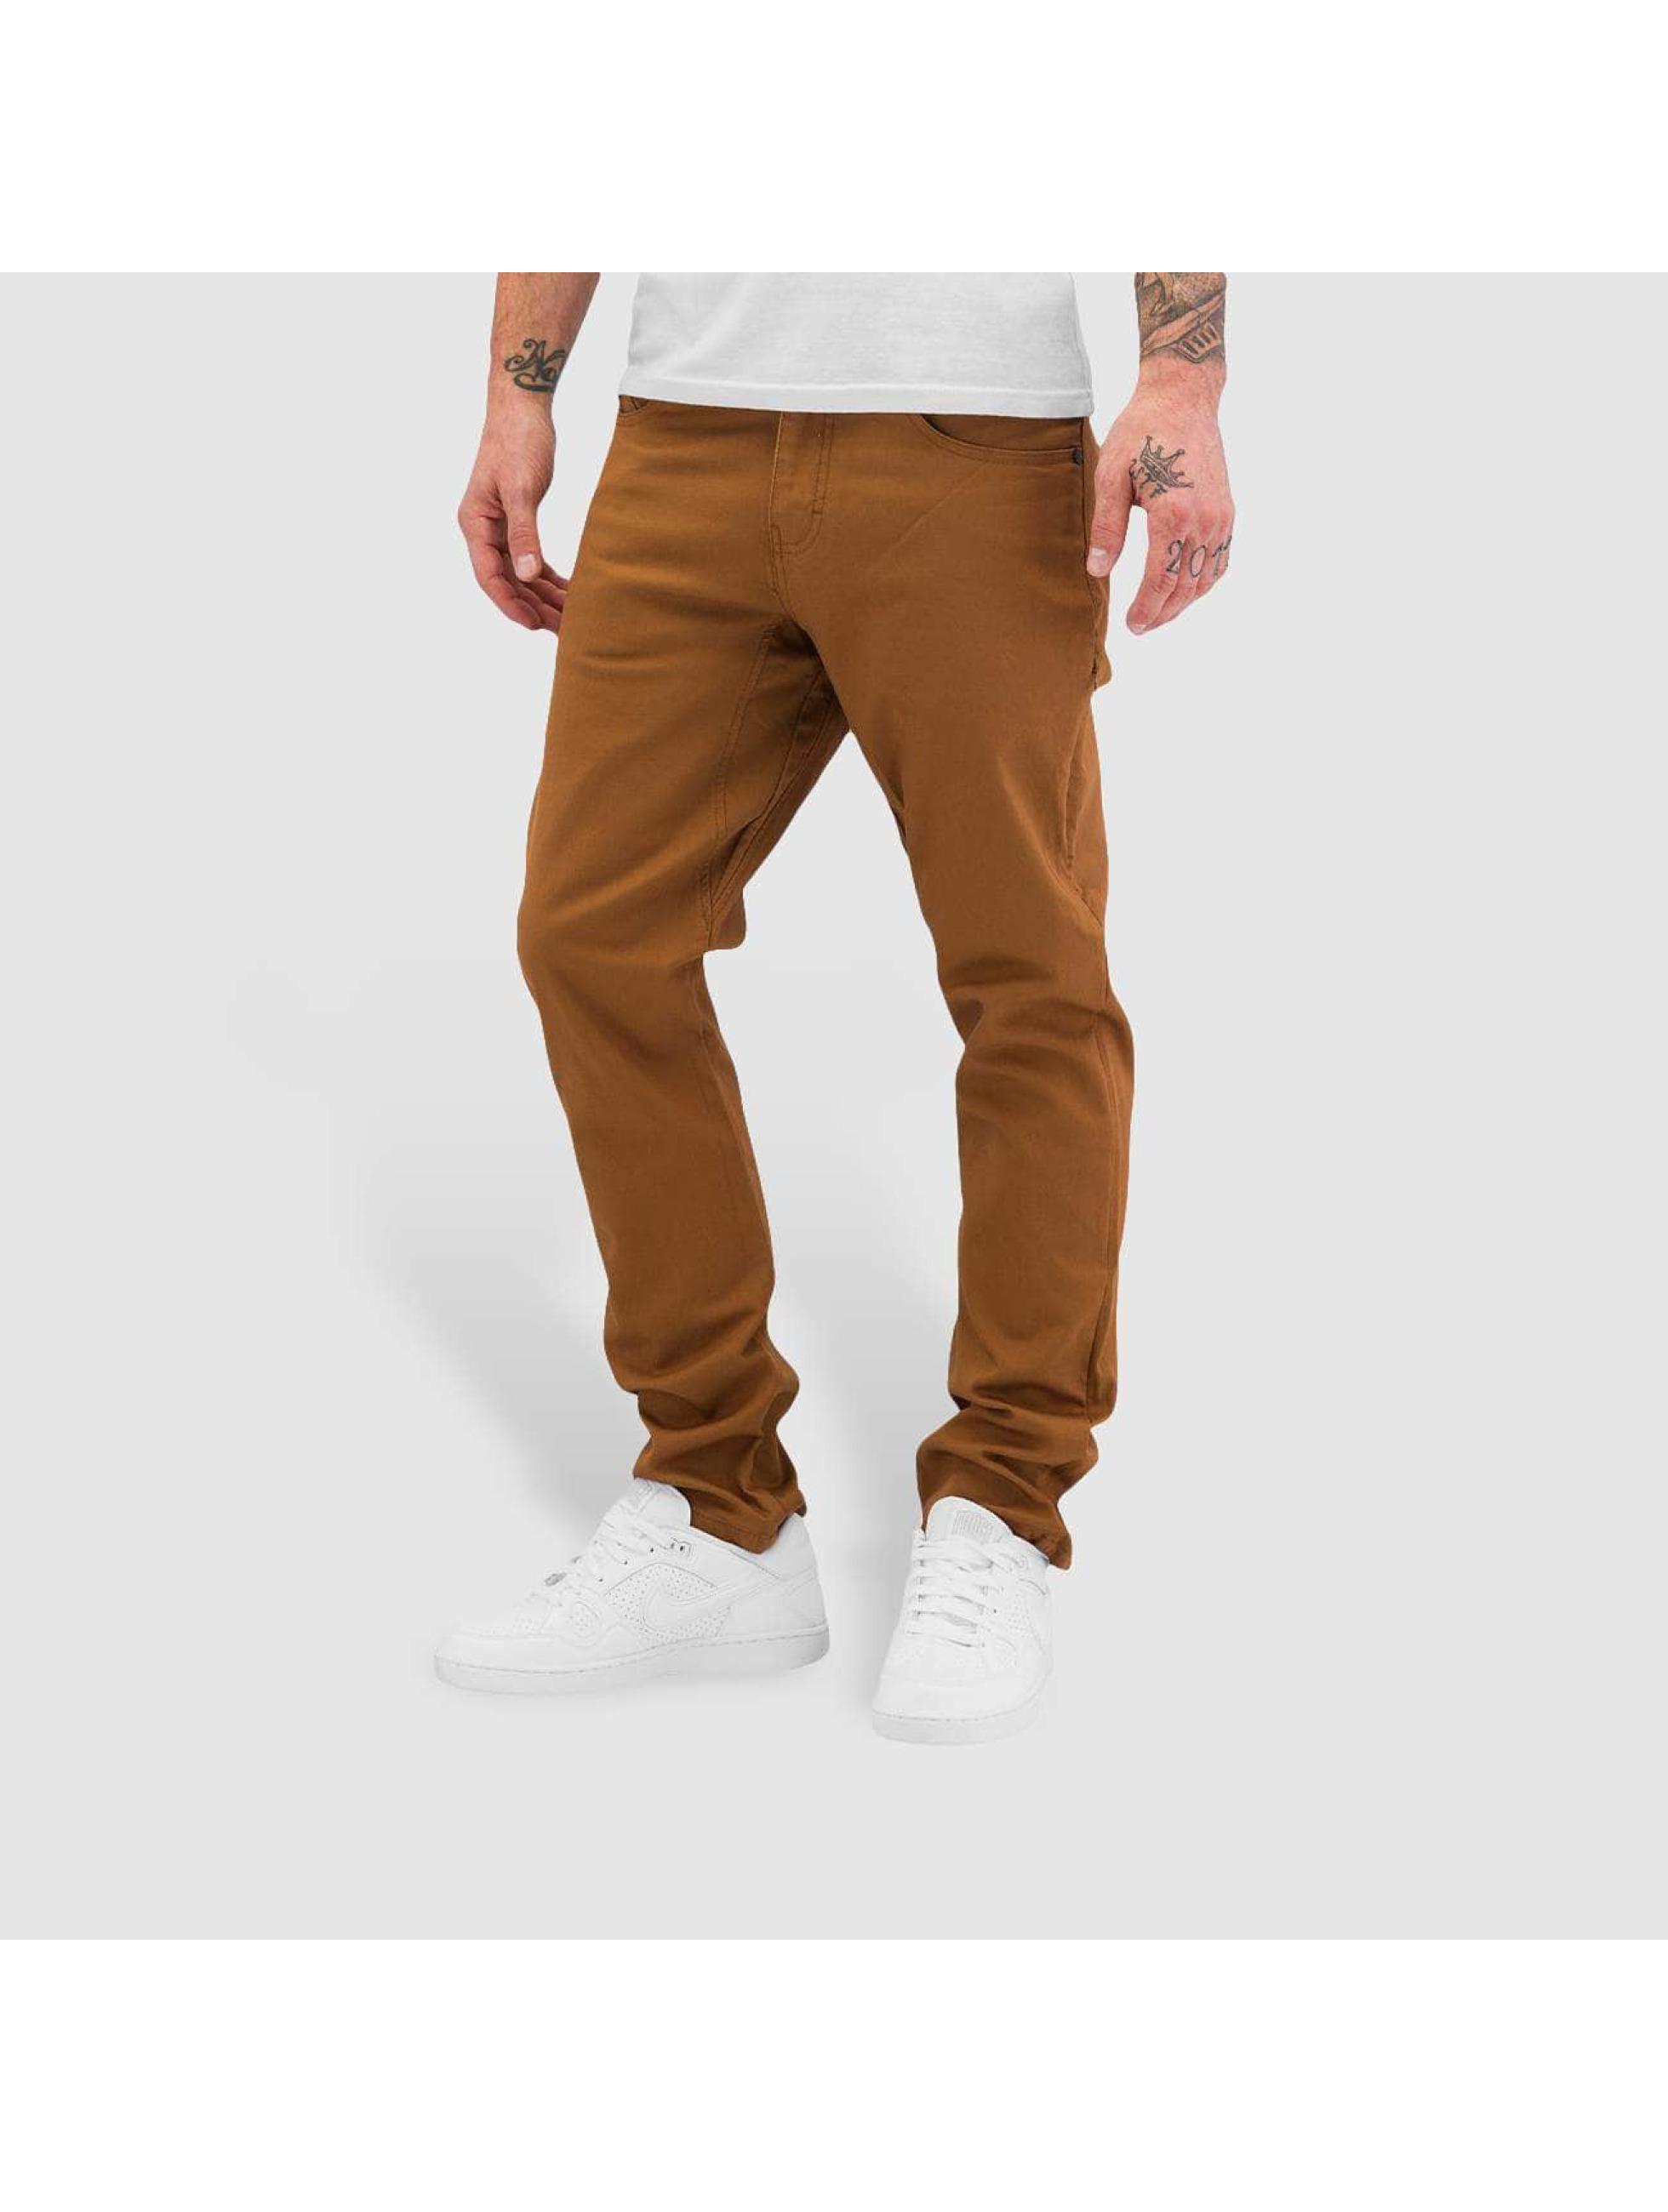 Nike Pantalon chino SB 5 Pocket brun